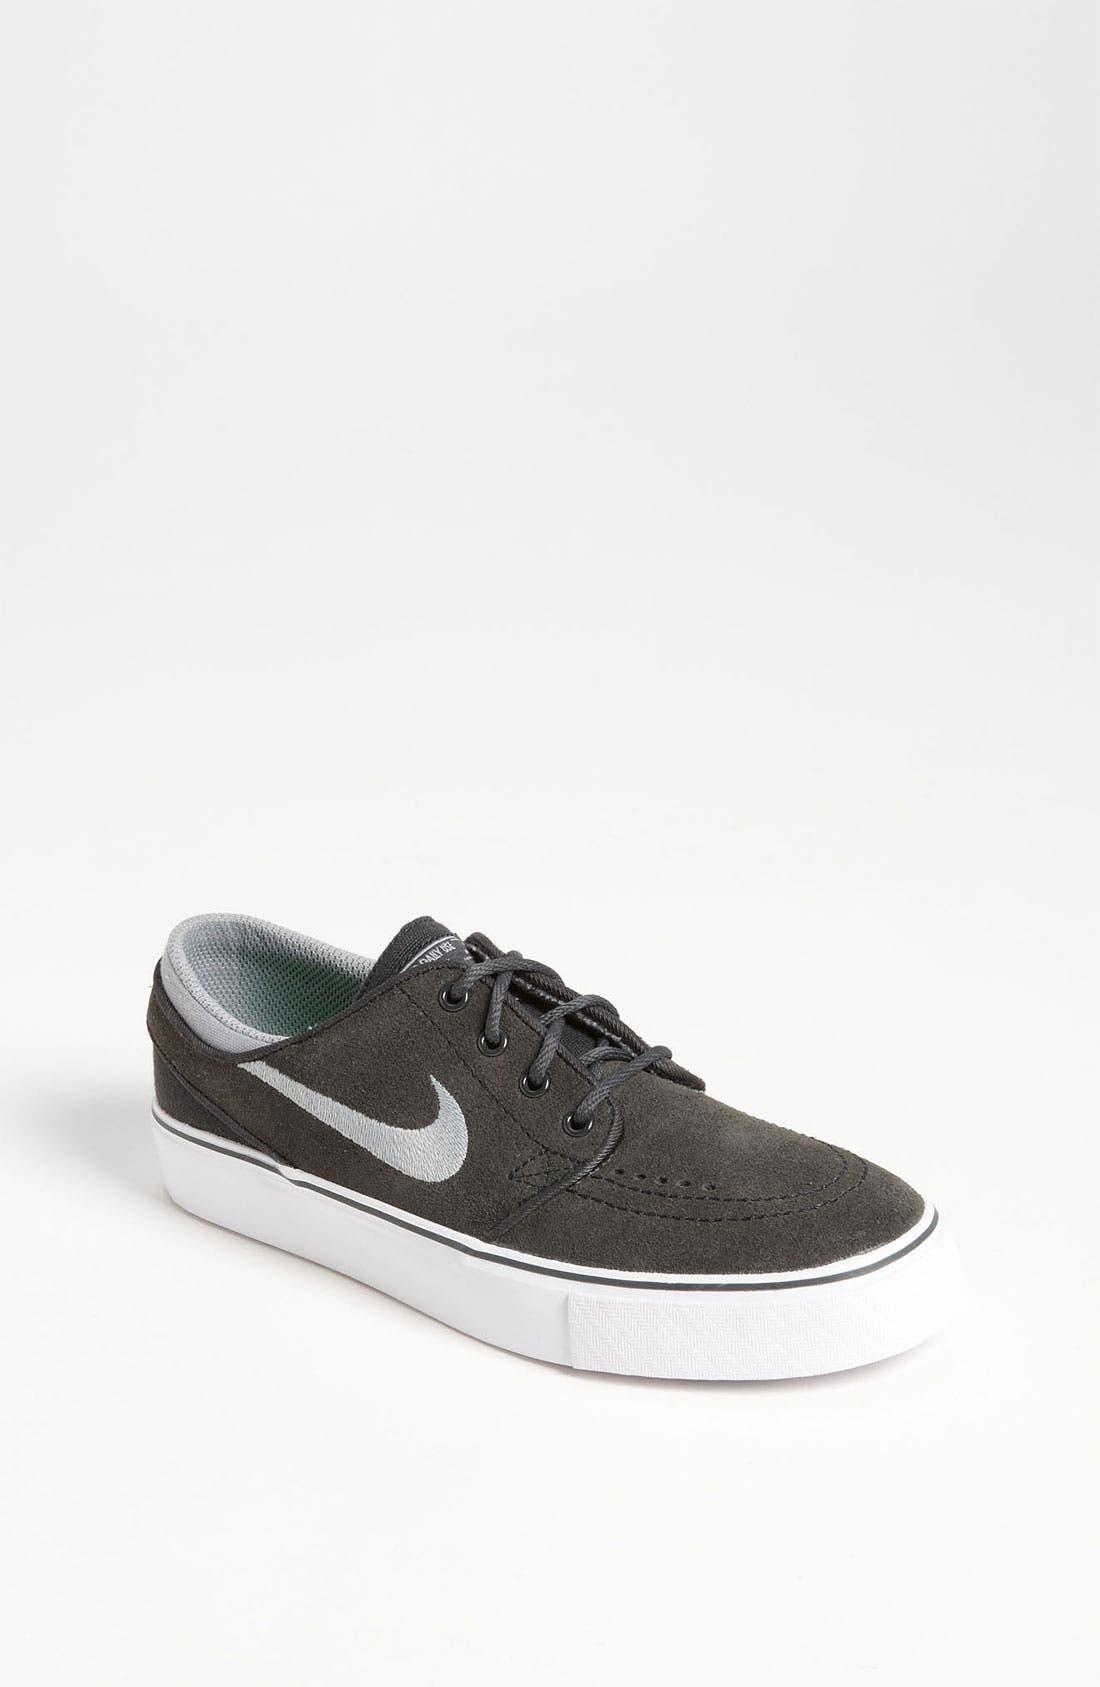 'Stefan Janoski' Sneaker,                             Main thumbnail 1, color,                             Anthracite/ Grey